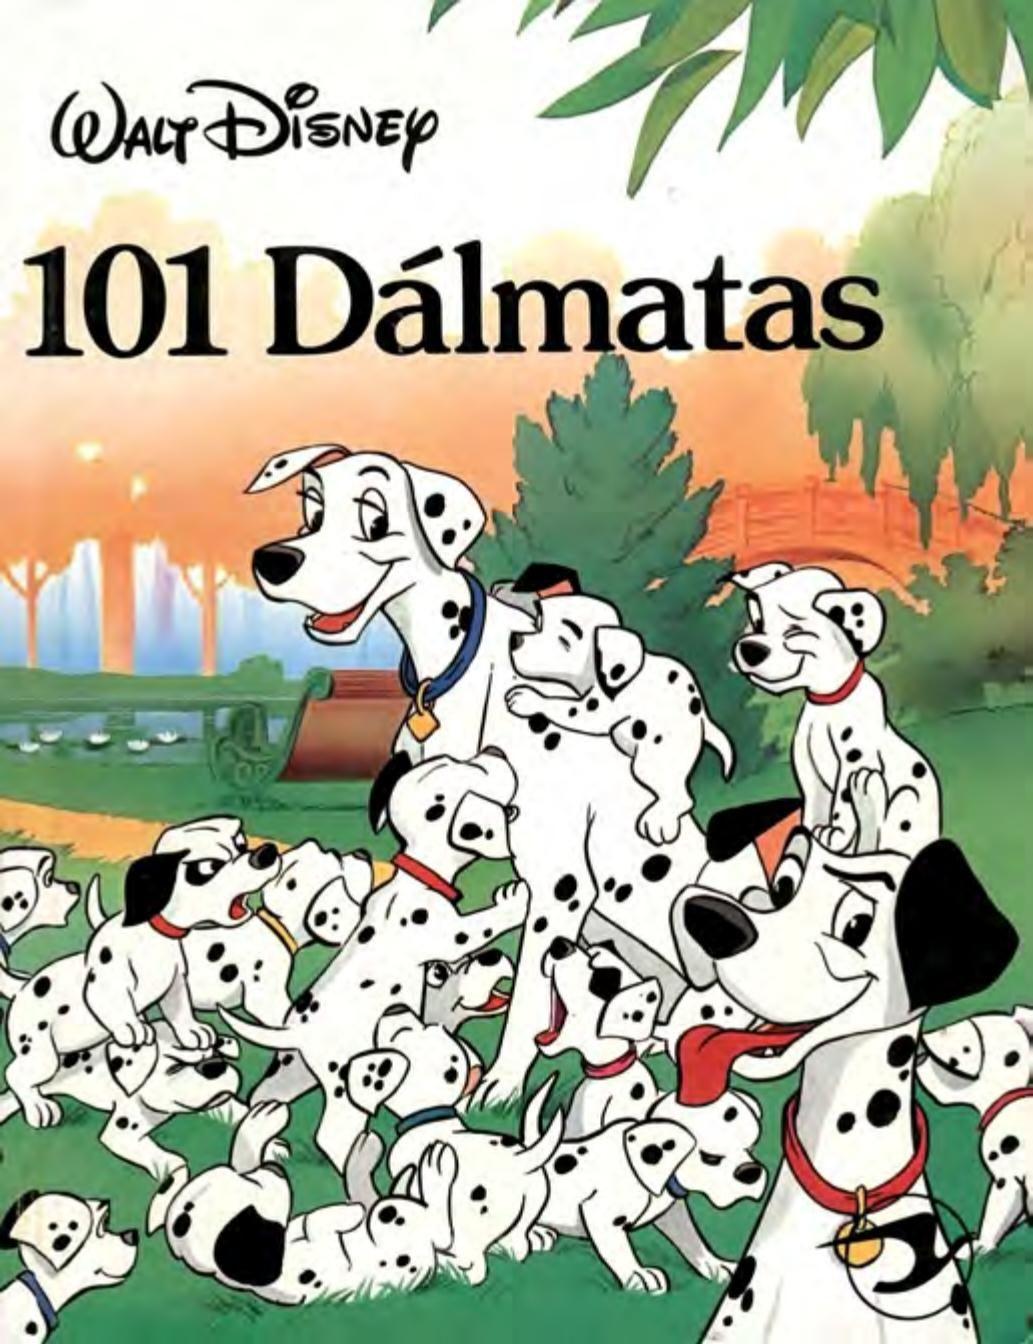 101 Dalmatas Disney Storybook Dalmatian 101 Dalmatians